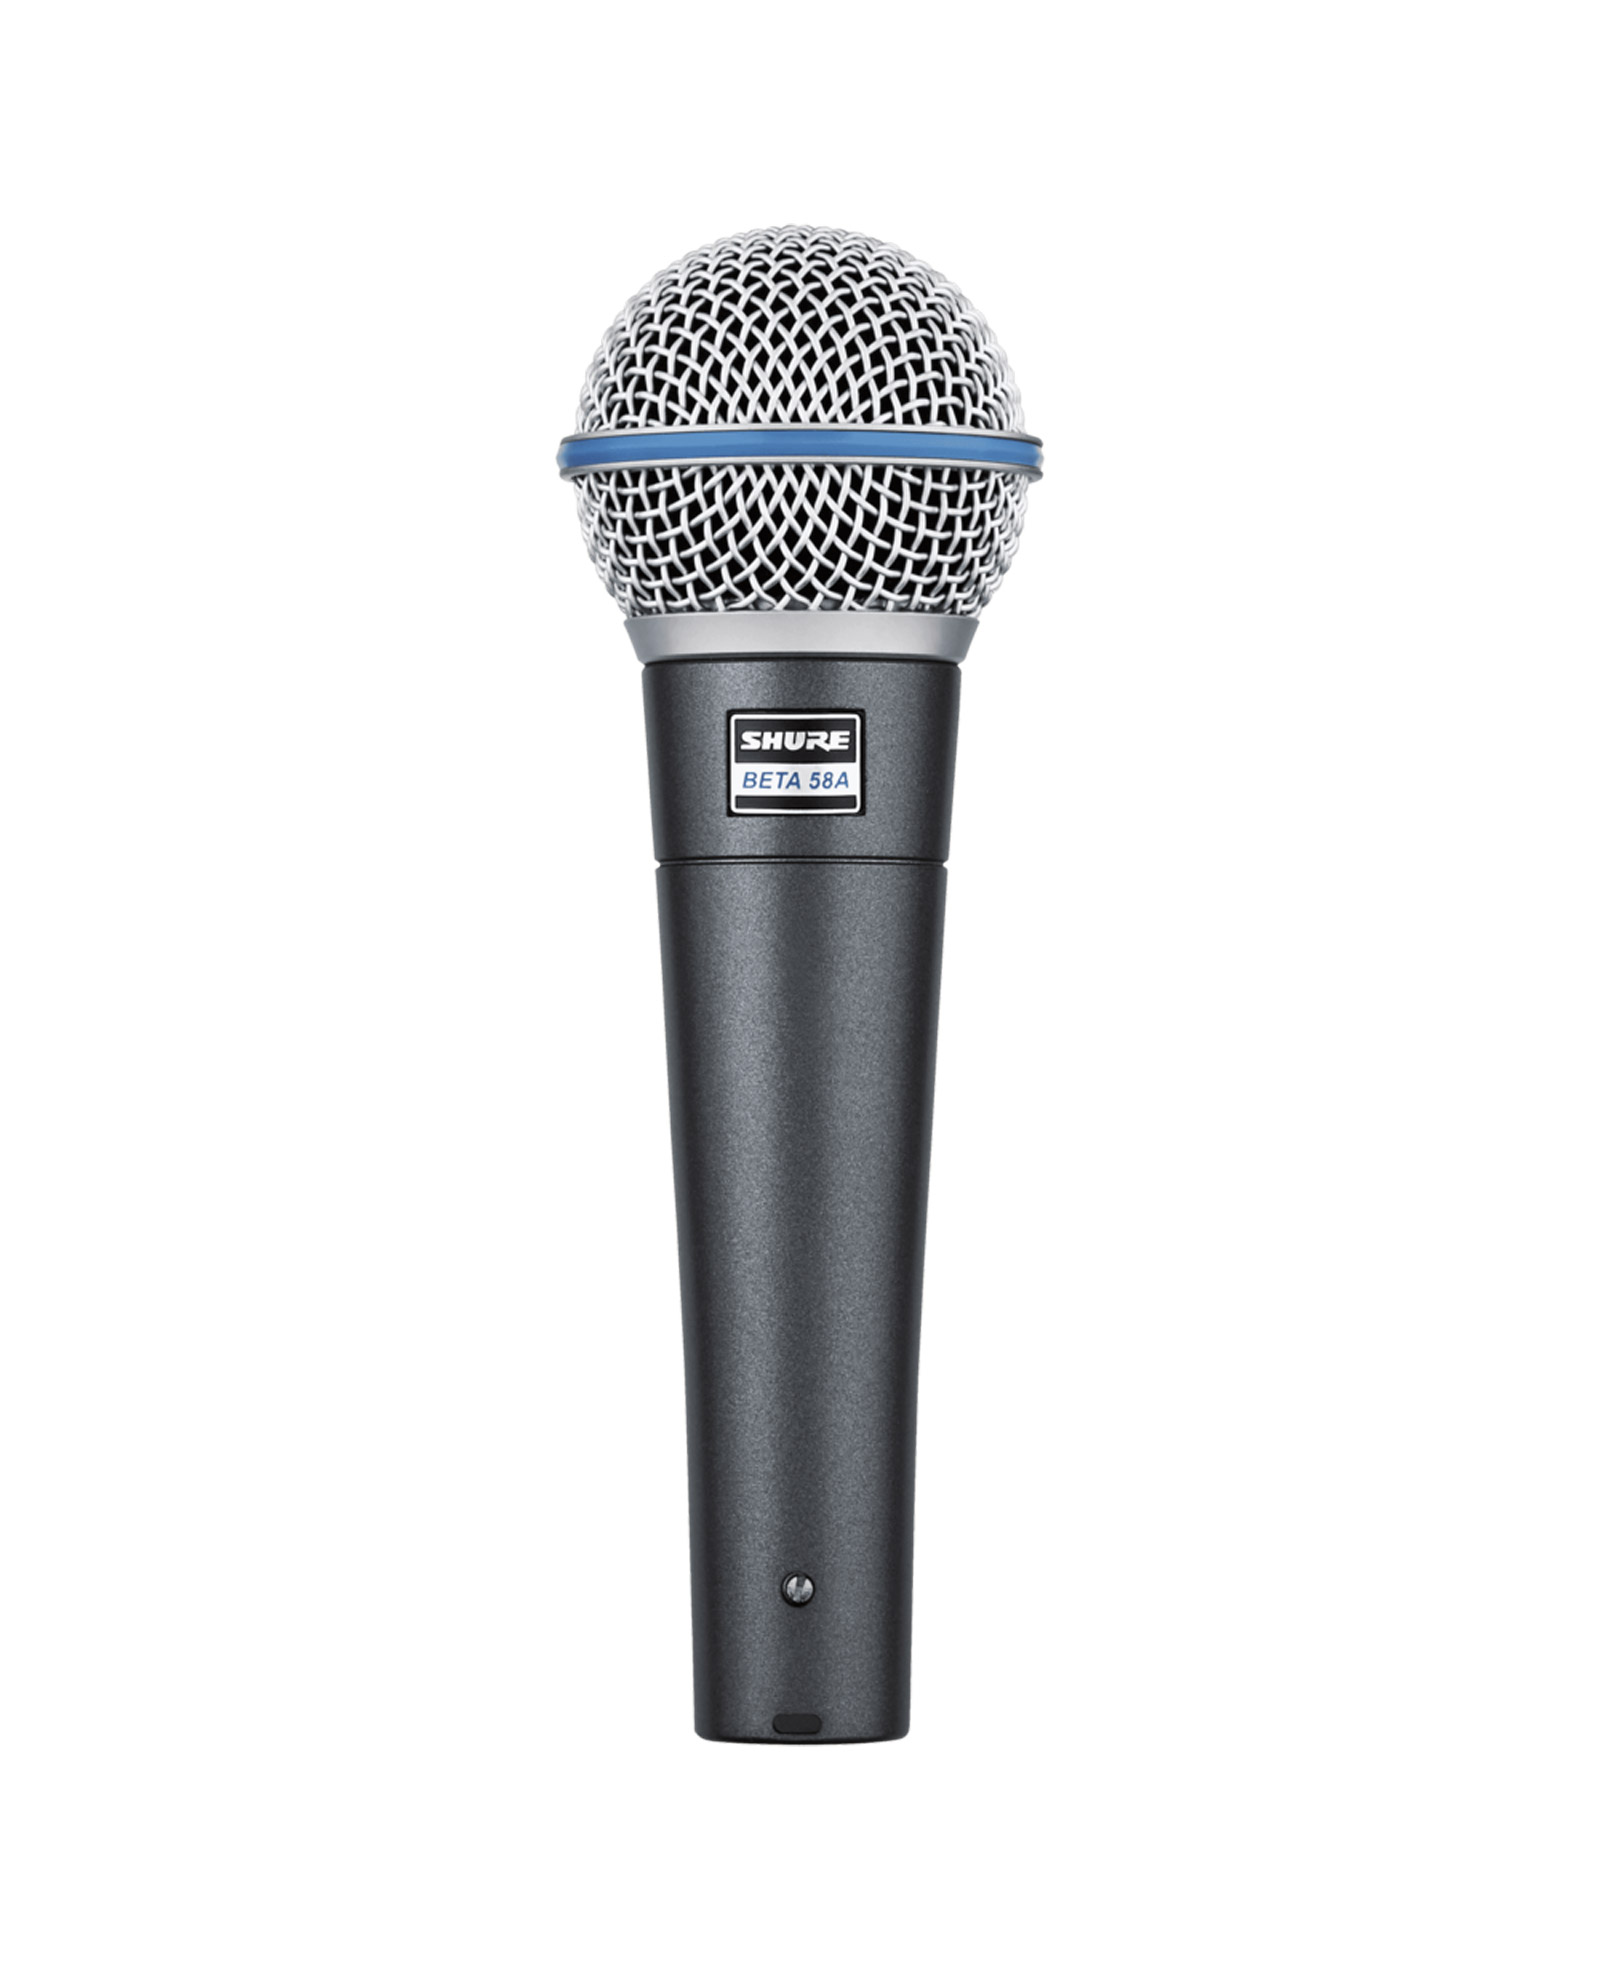 Shure Beta58a Vocal Microphone 1